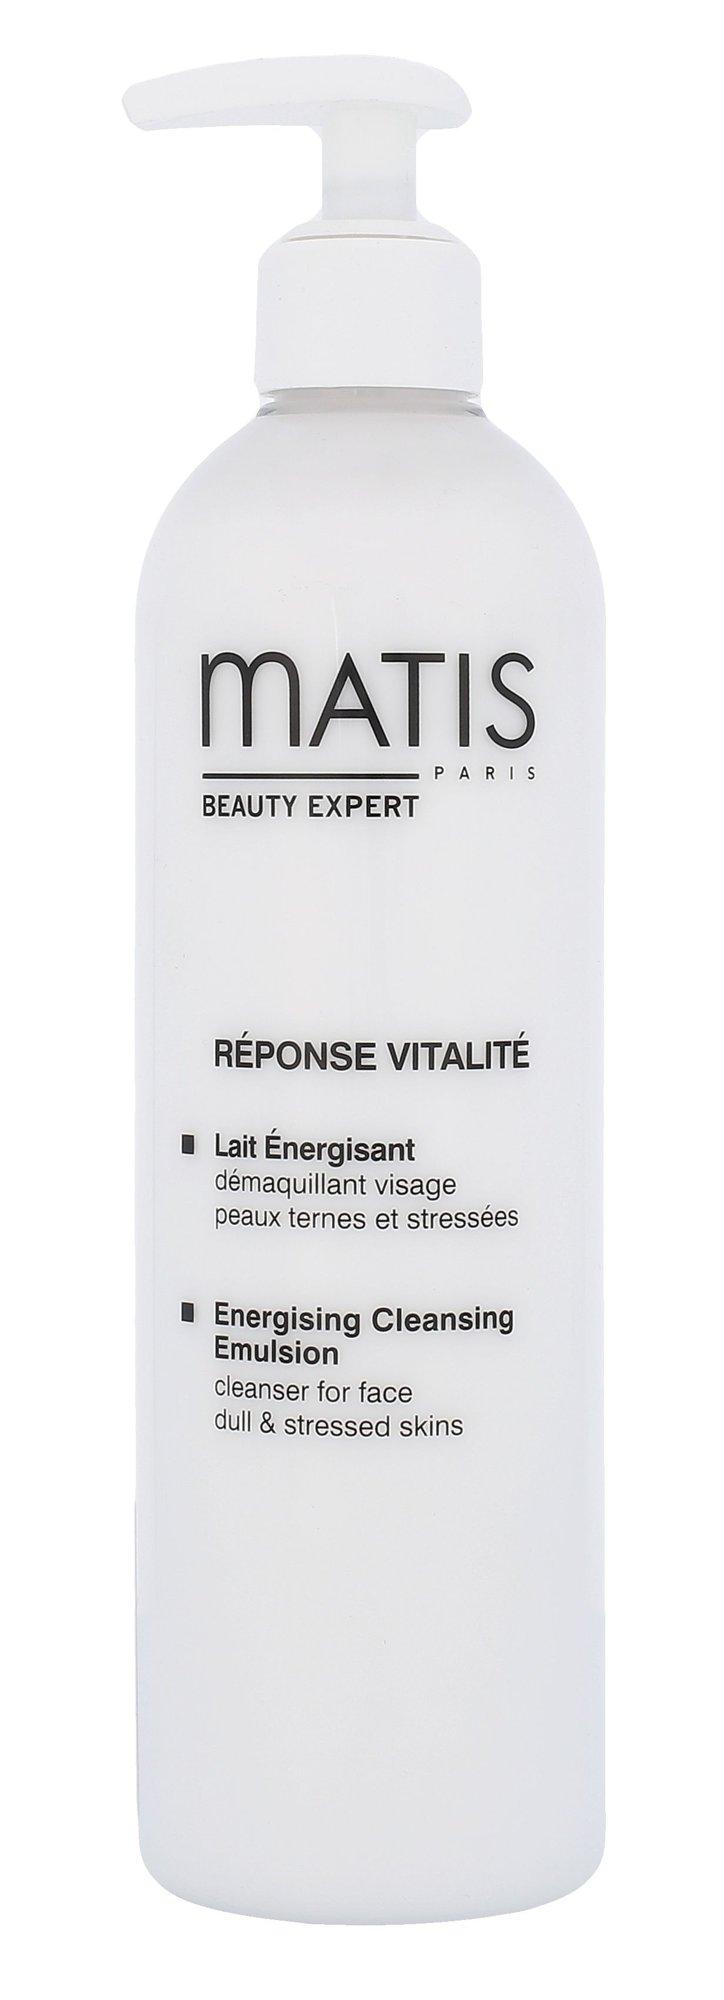 Matis Réponse Vitalité Cosmetic 400ml  Energising Cleansing Emulsion